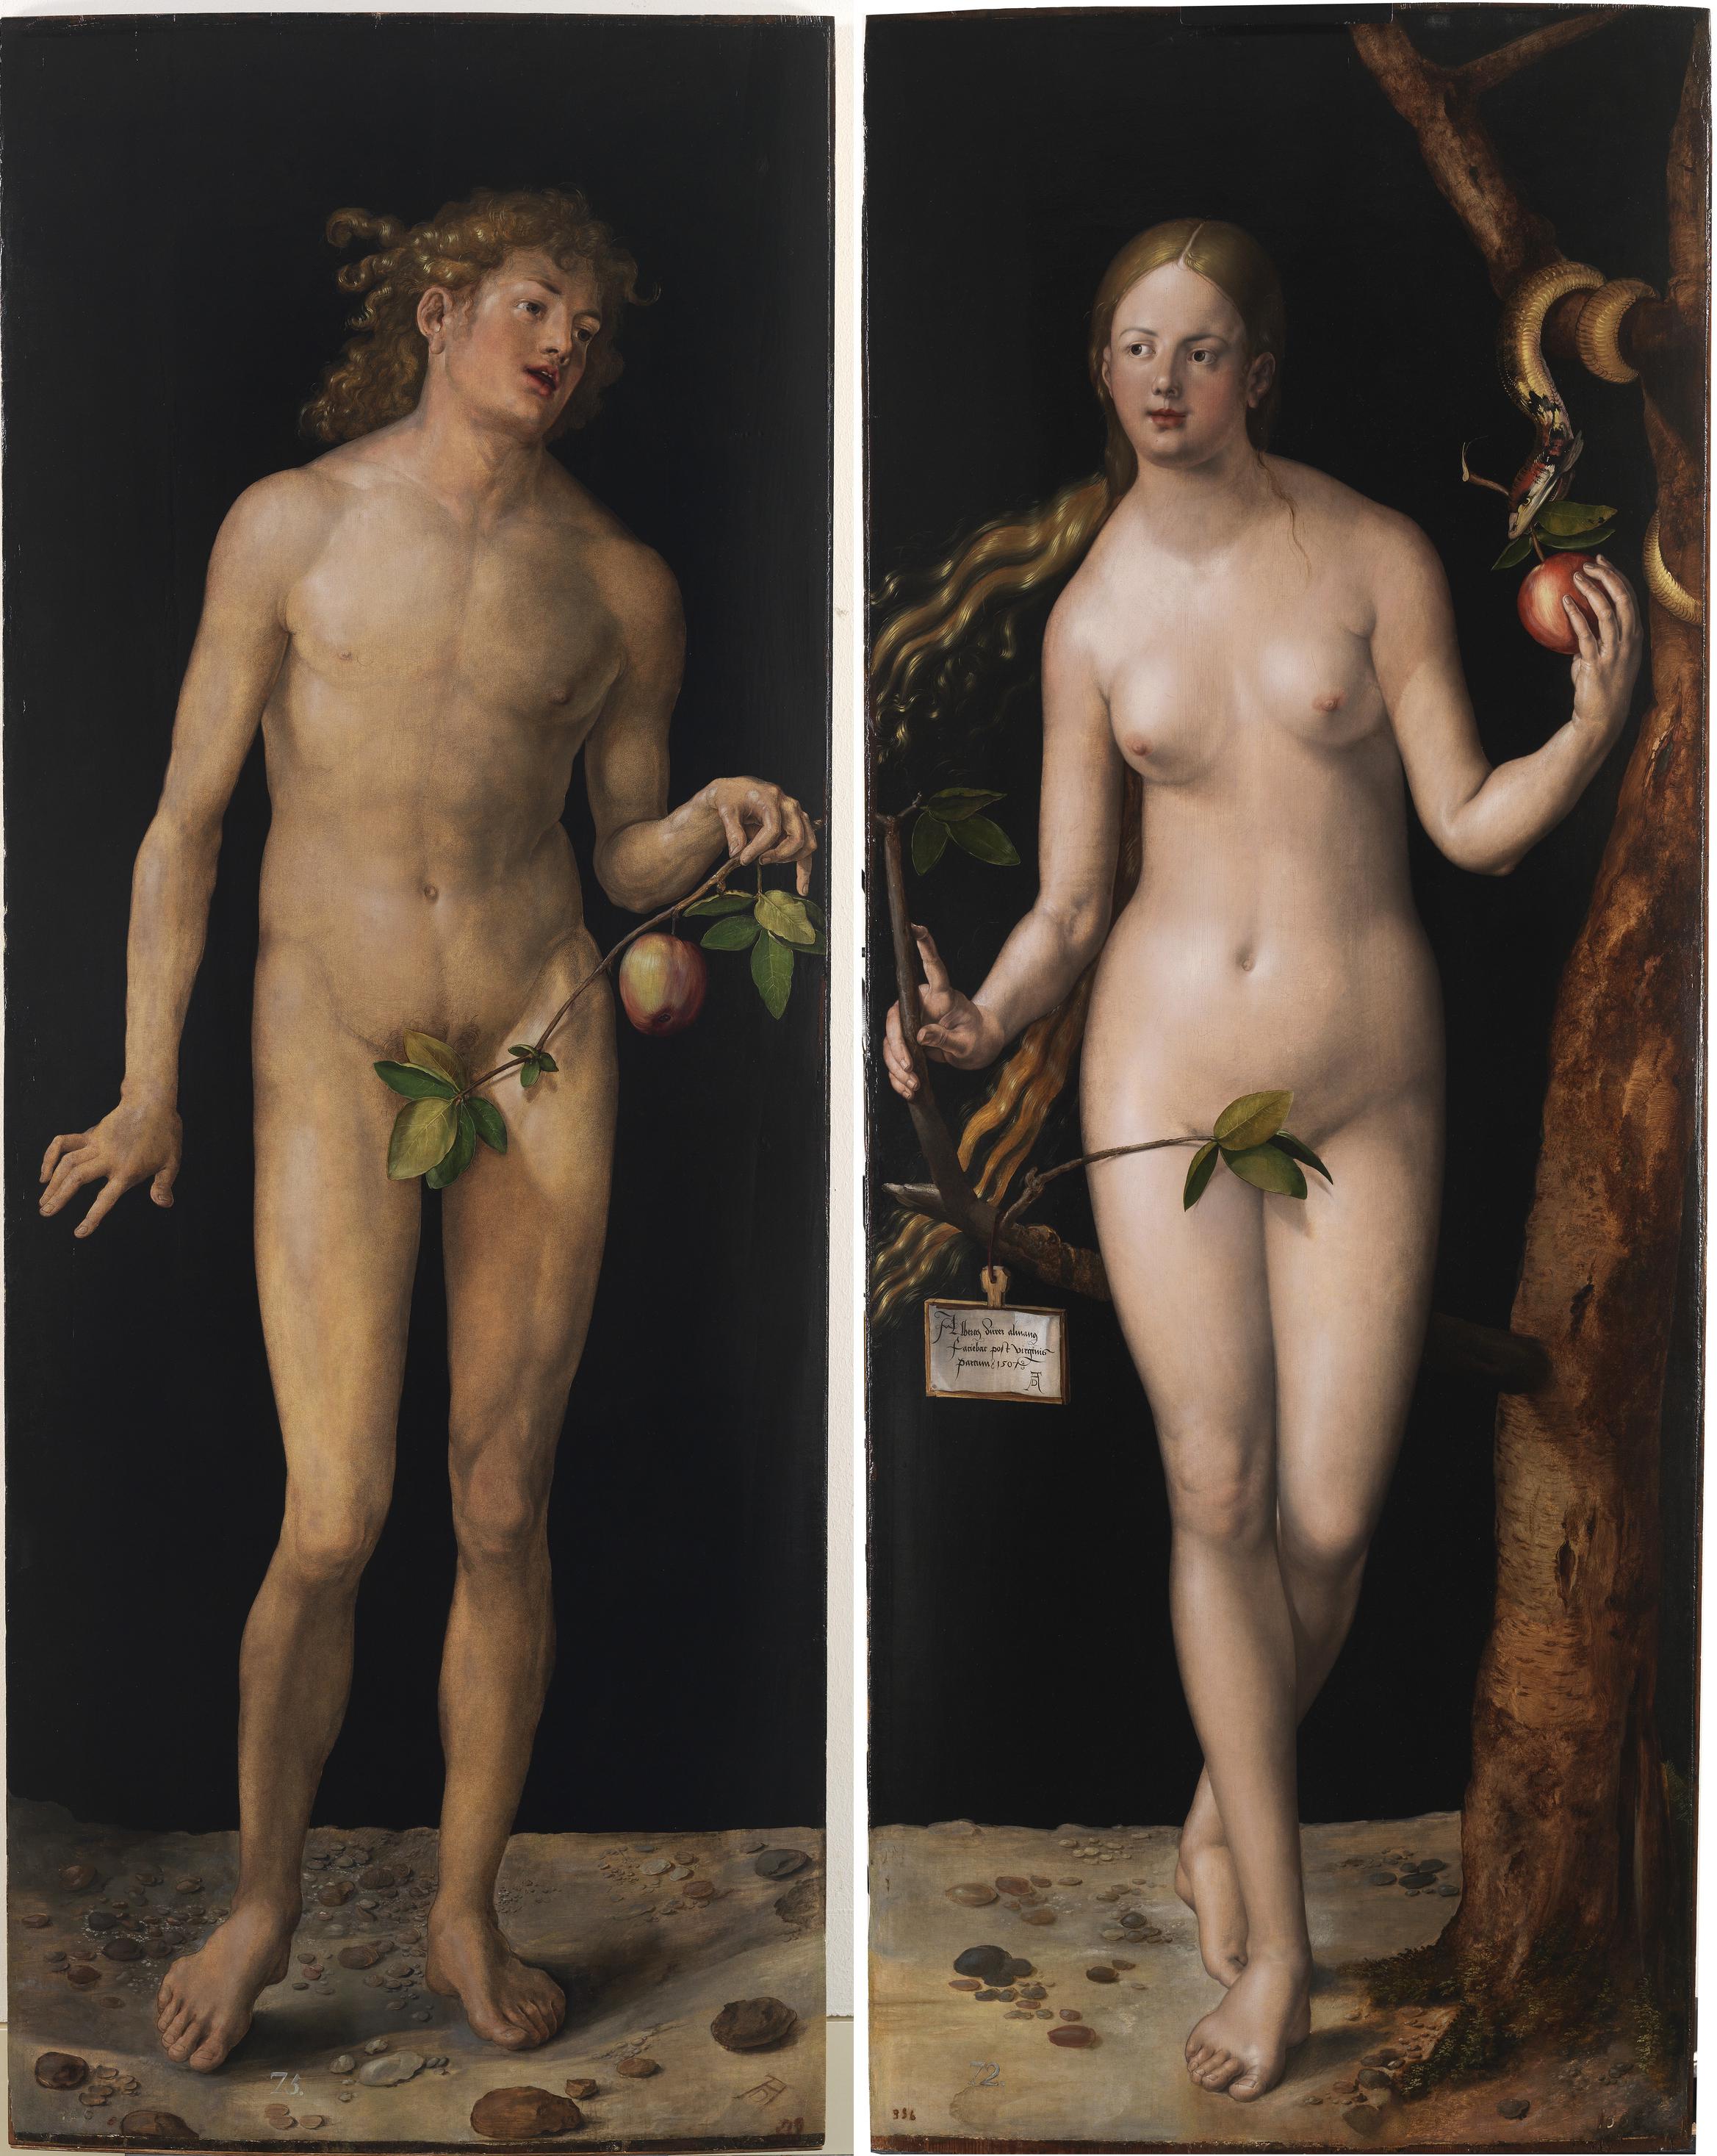 Albrecht_Dürer_-_Adam_and_Eve_(Prado)_2